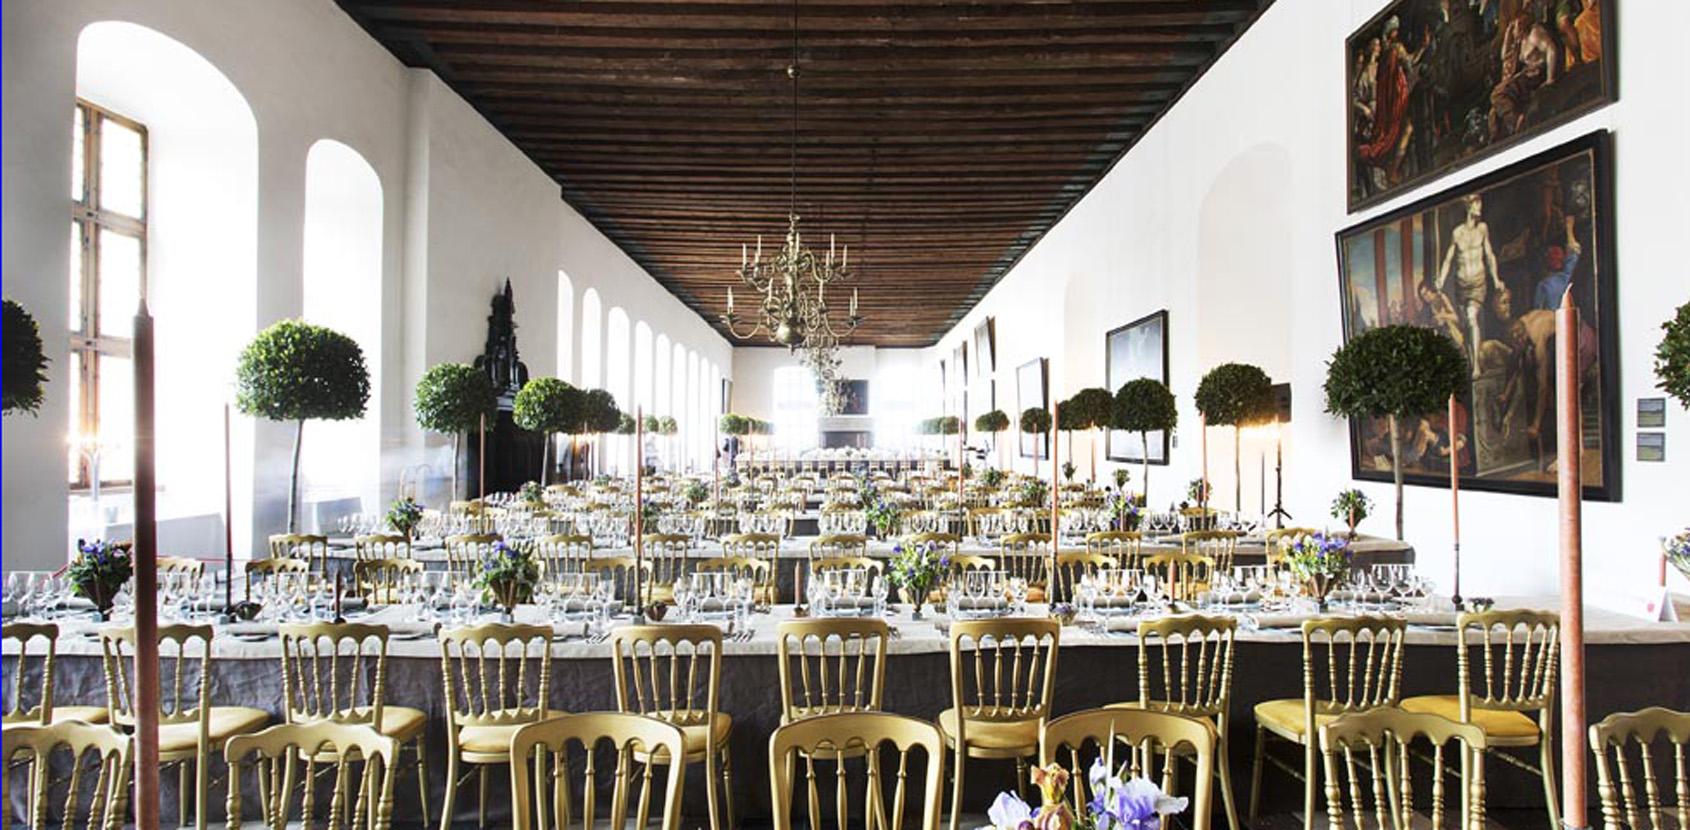 The Ballroom Kronborg Castle Photo: Thorkild Jensen